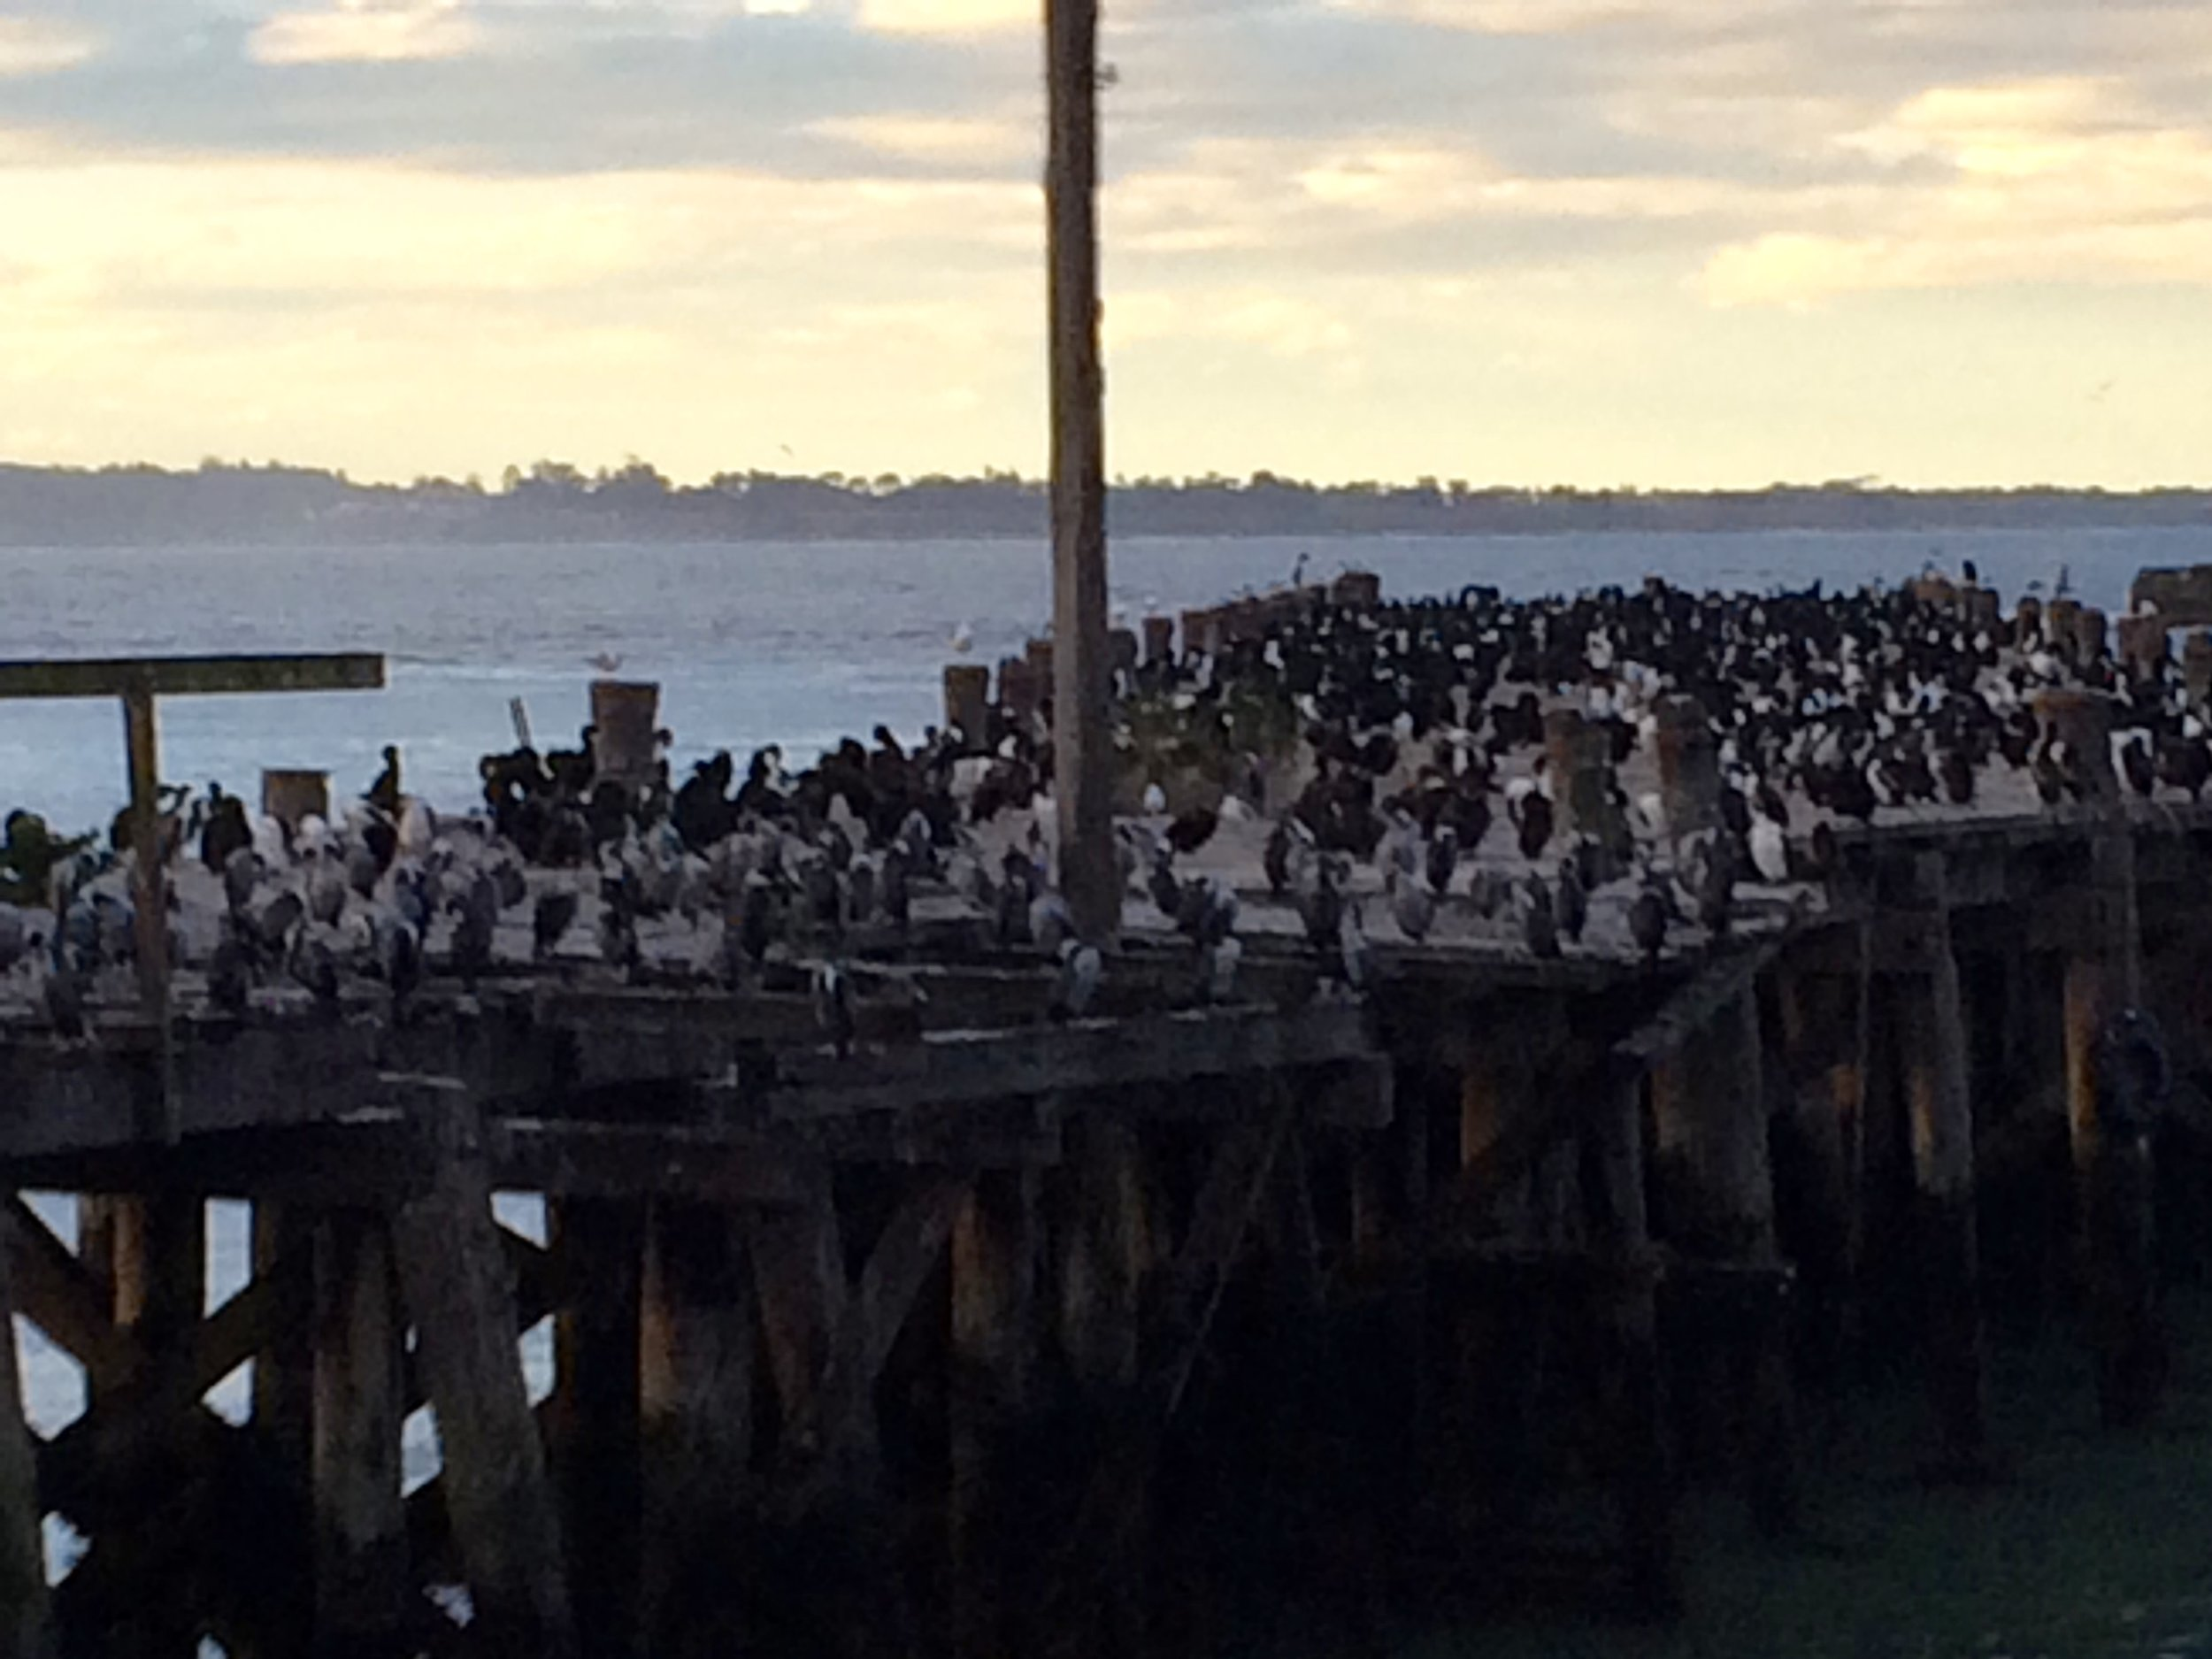 Birds on the pier outside the penguin site